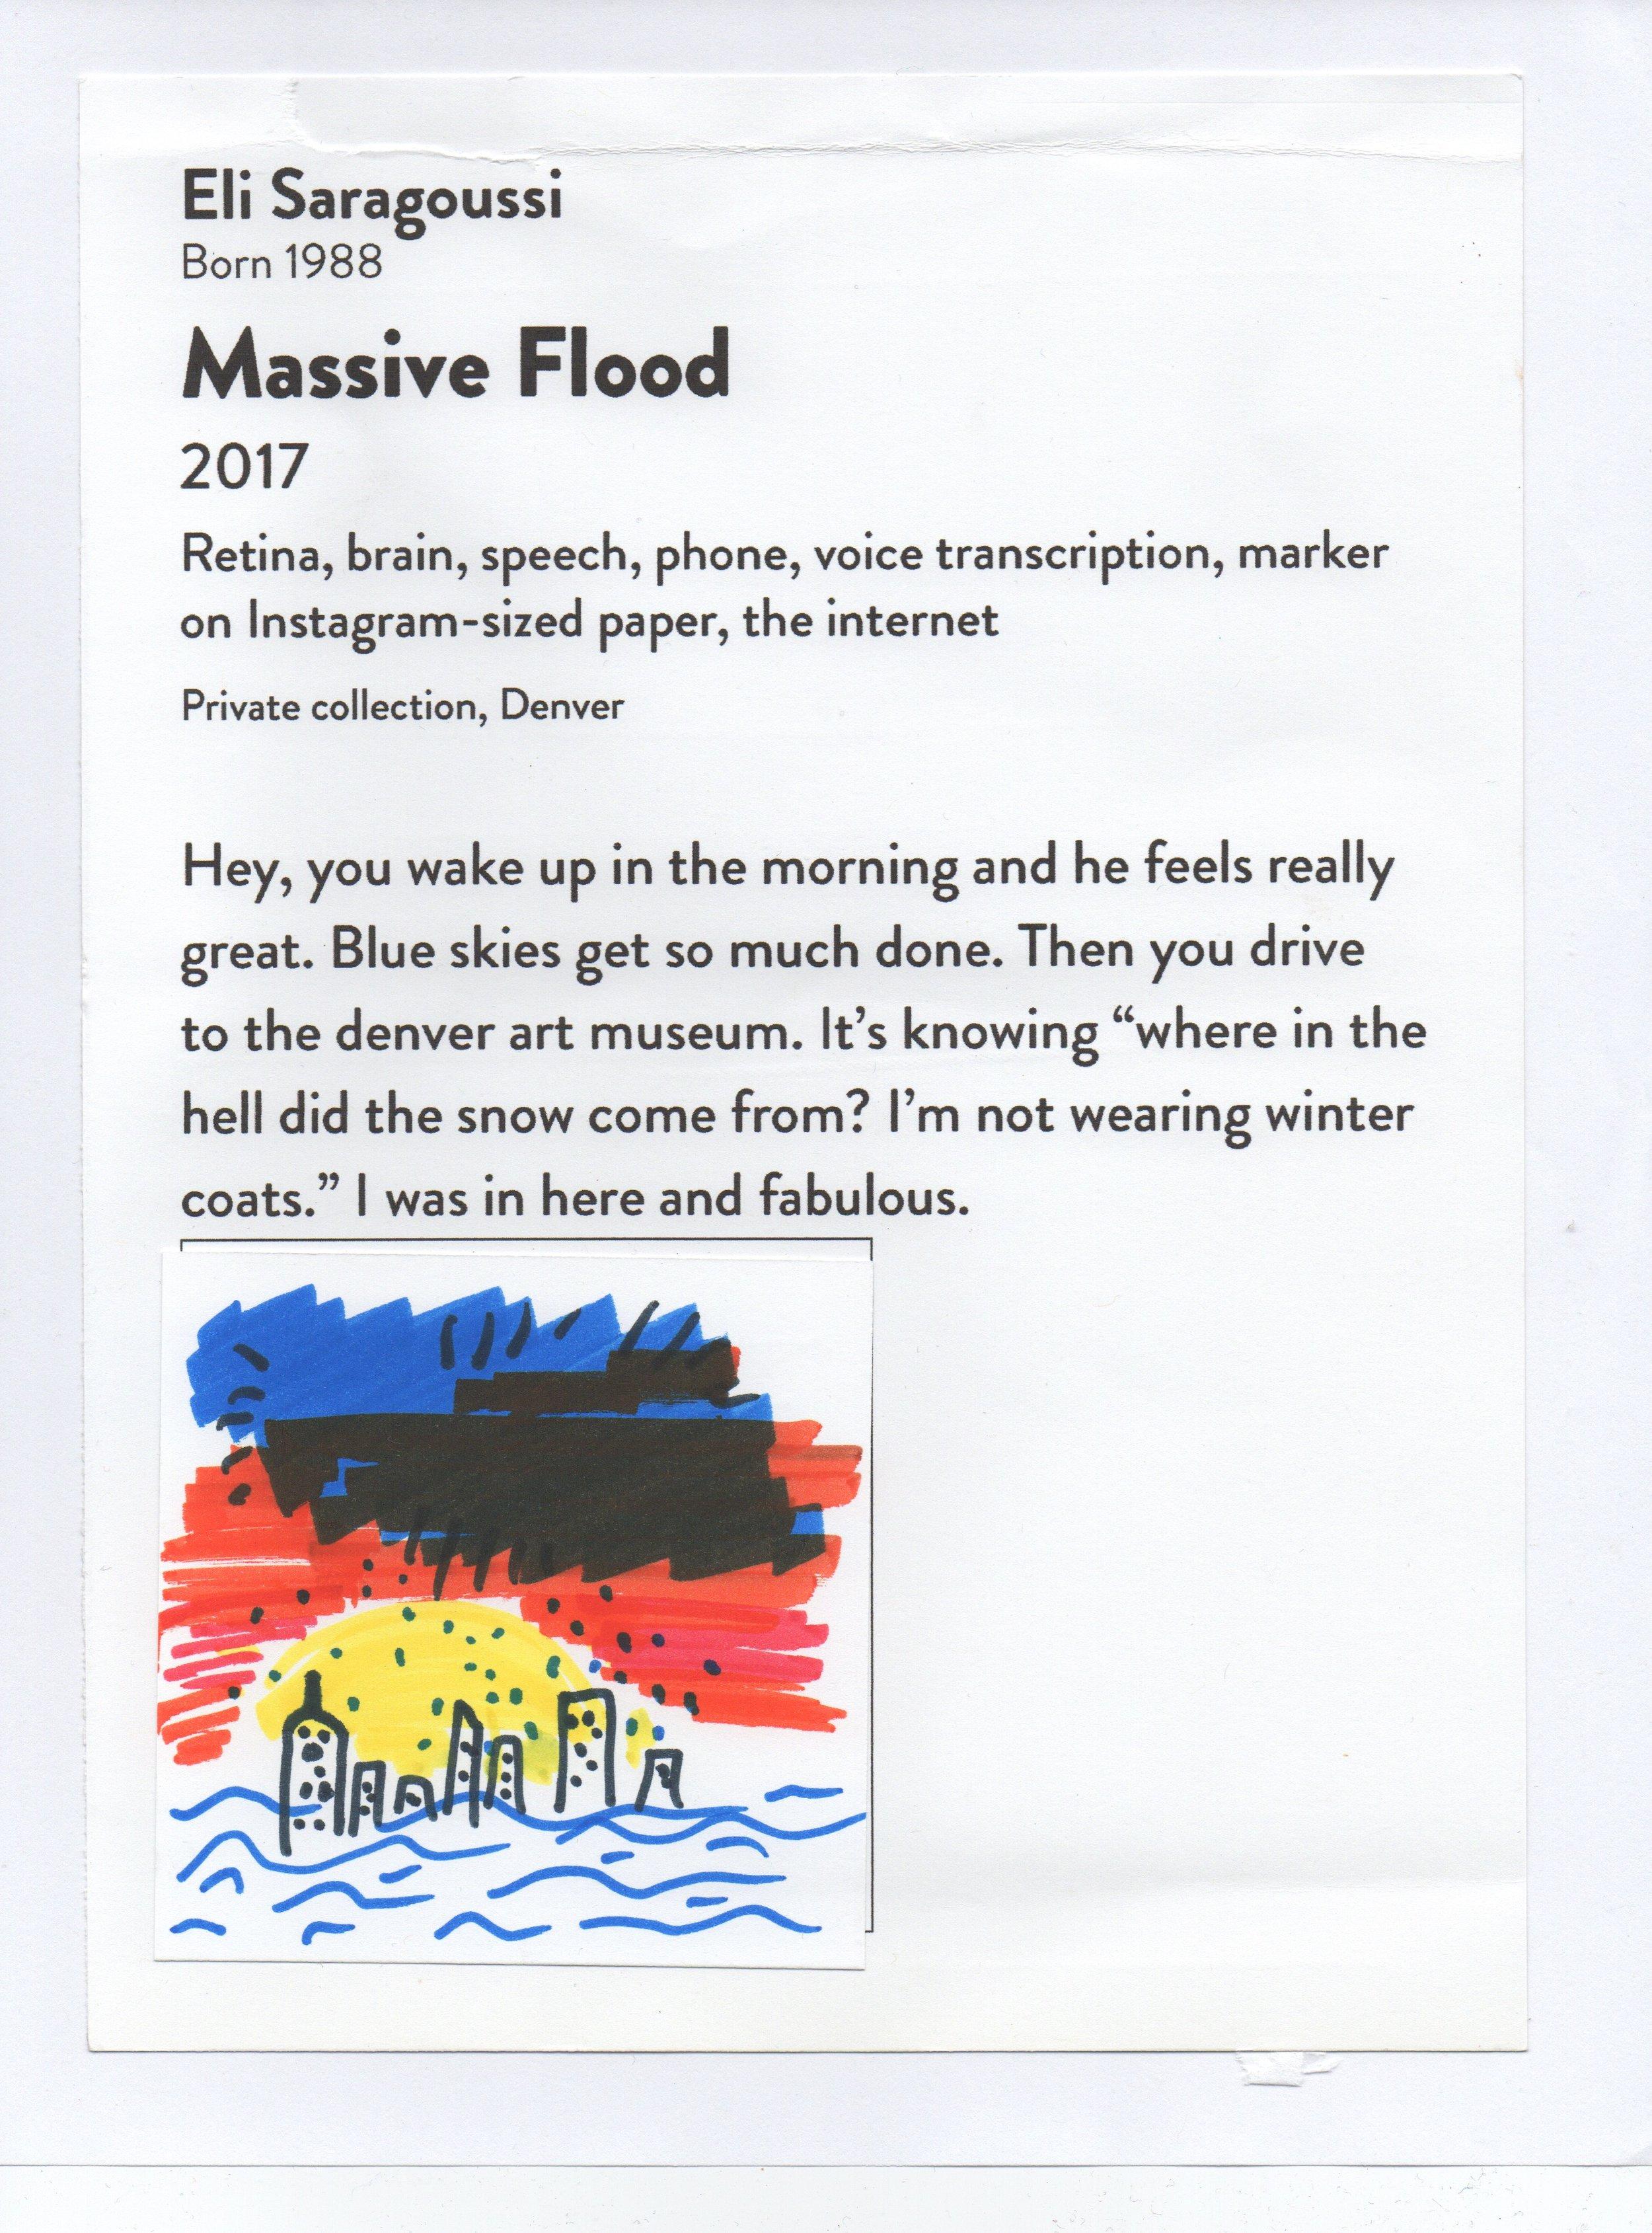 Massive Flood DAM Untitled April 28, 2017.jpeg